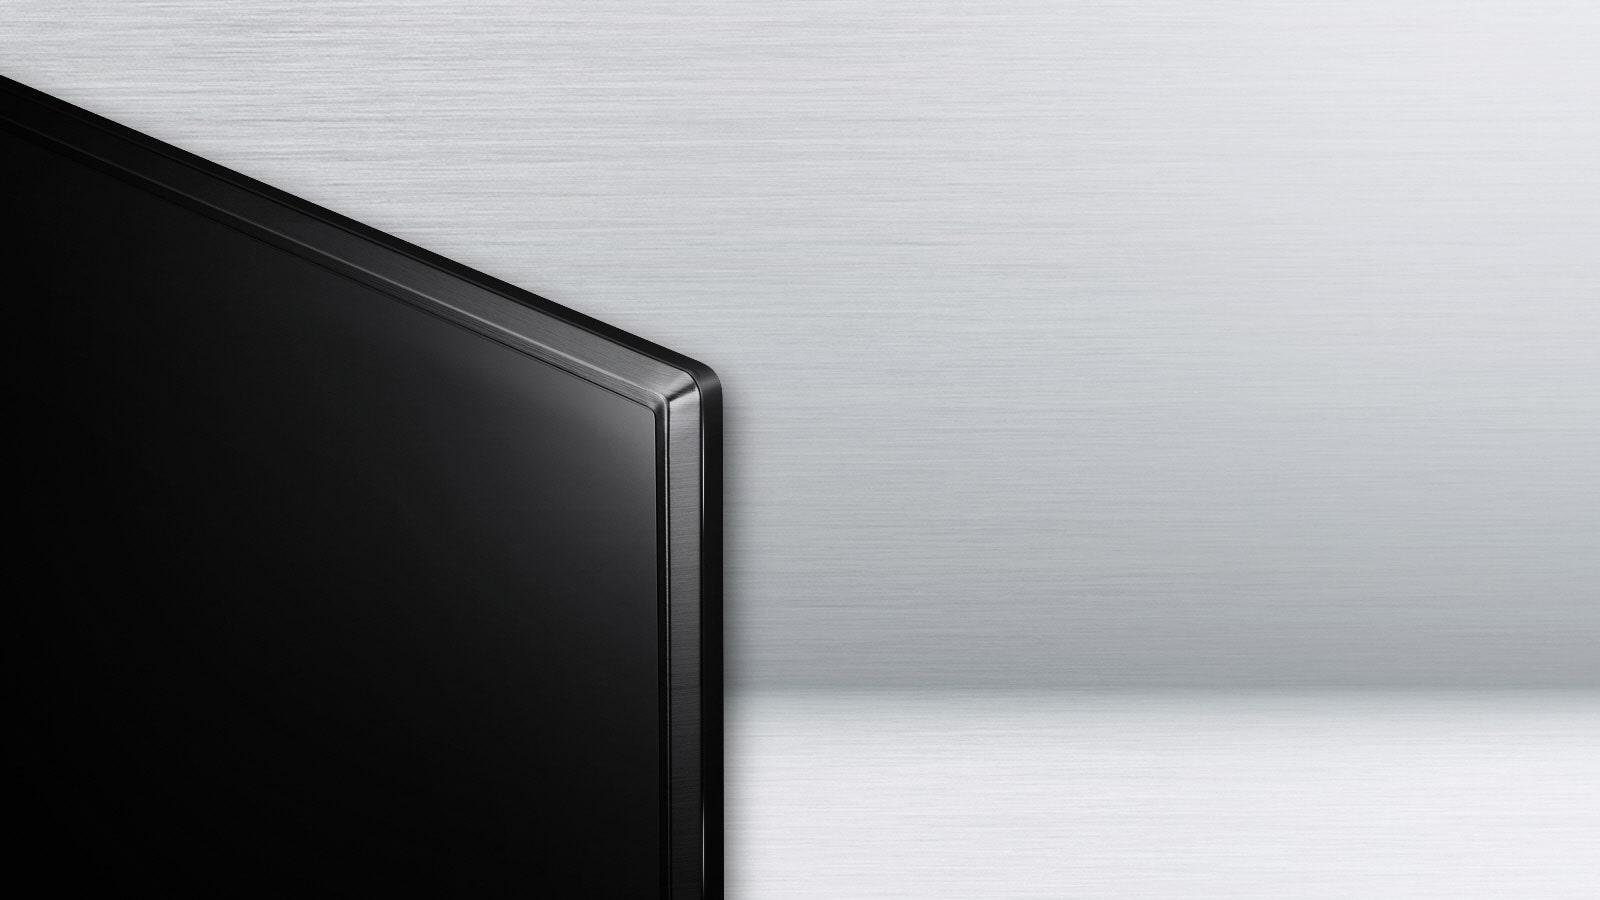 65_60_55_49_43UJ65_D_Metal-Frame-05072017-Desktop